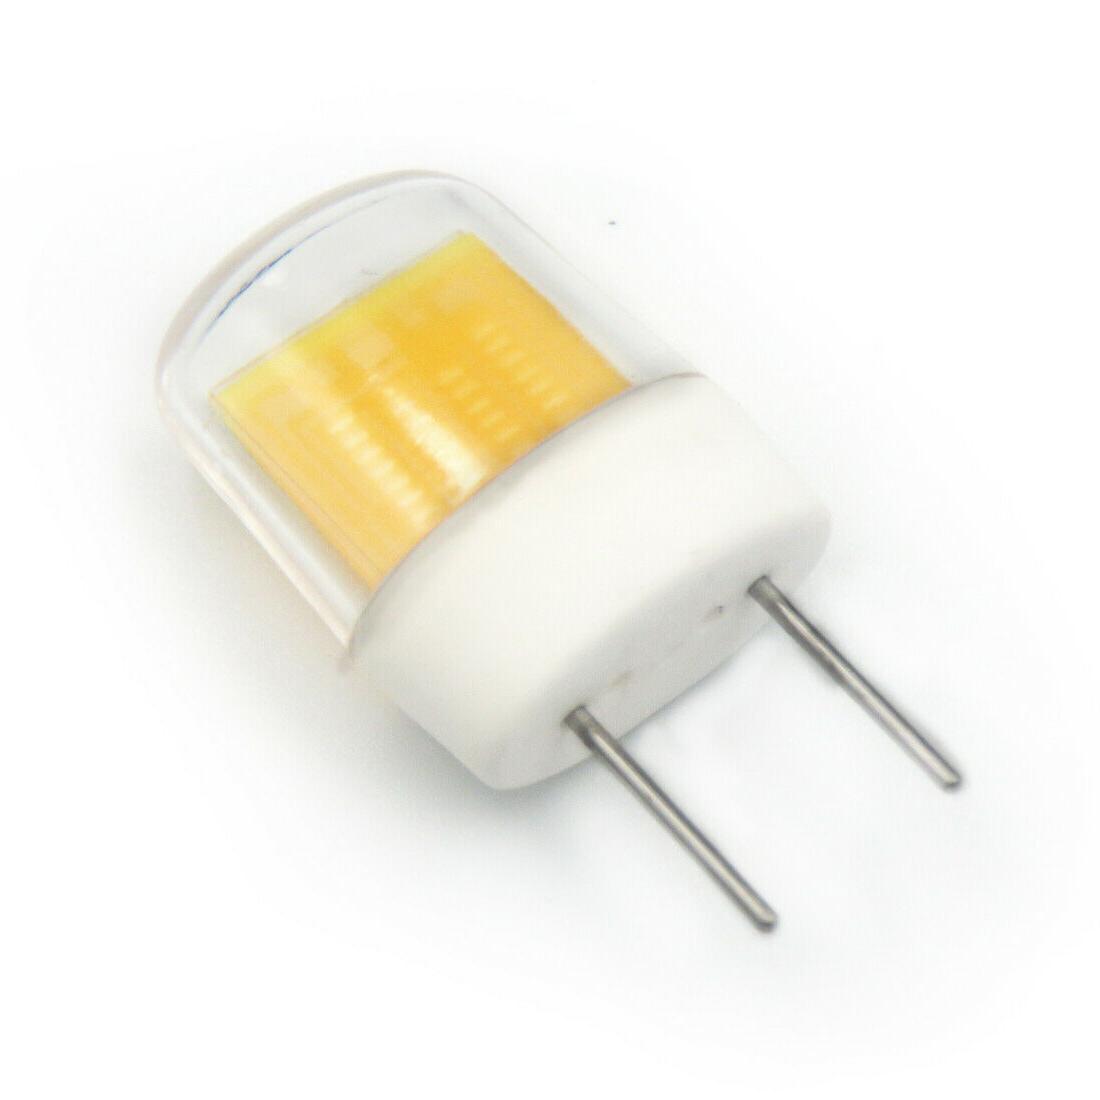 10pcs G8 Bulb Flat COB Ceramics 3W Warm